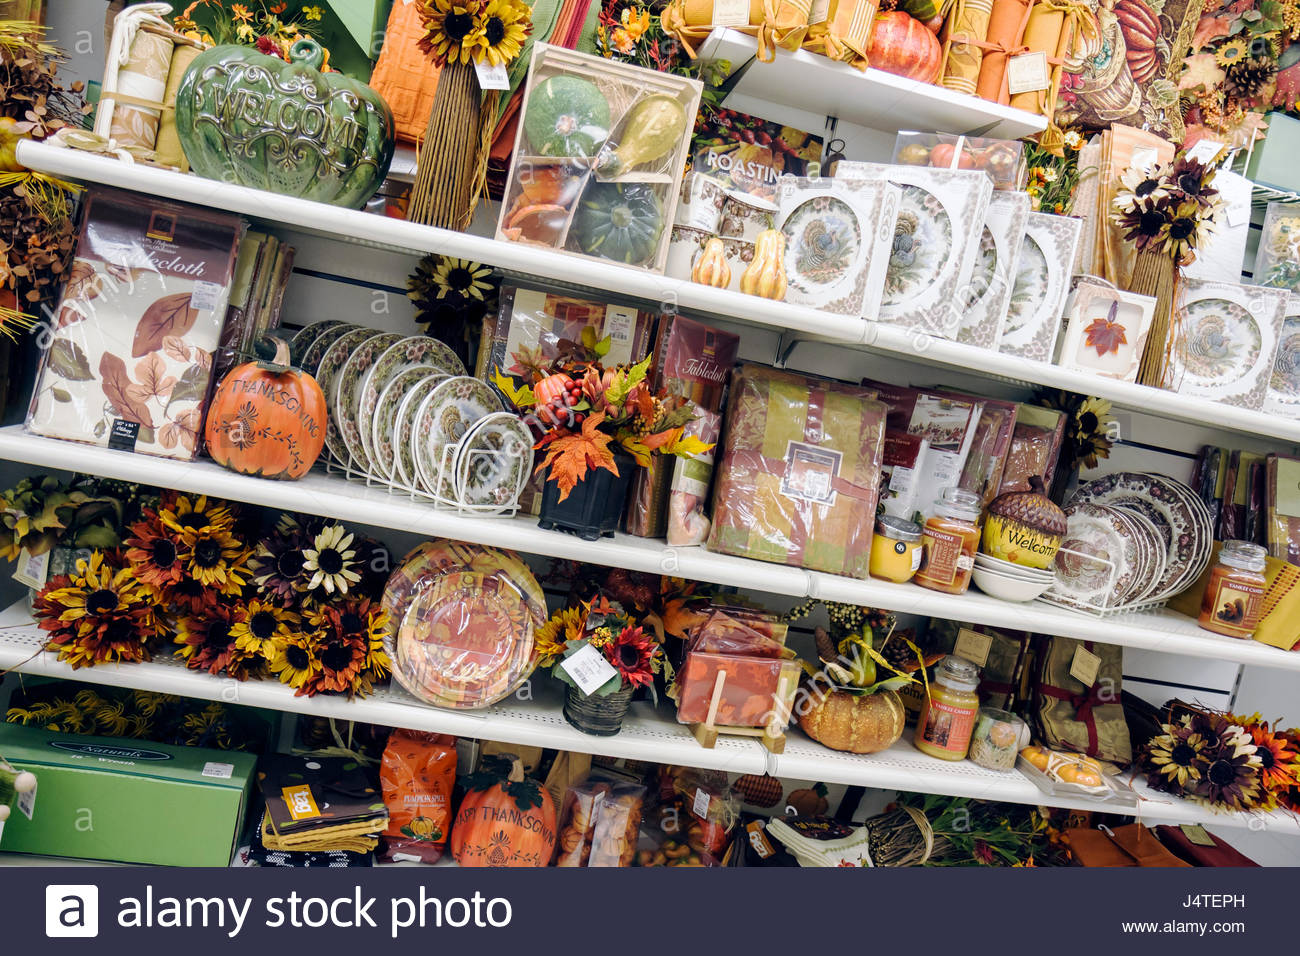 Naples Florida T.J. TJ Maxx Shopping Retail Business Discount Chain Store  Merchandise Display Home Decor Tableware Plates Autumn